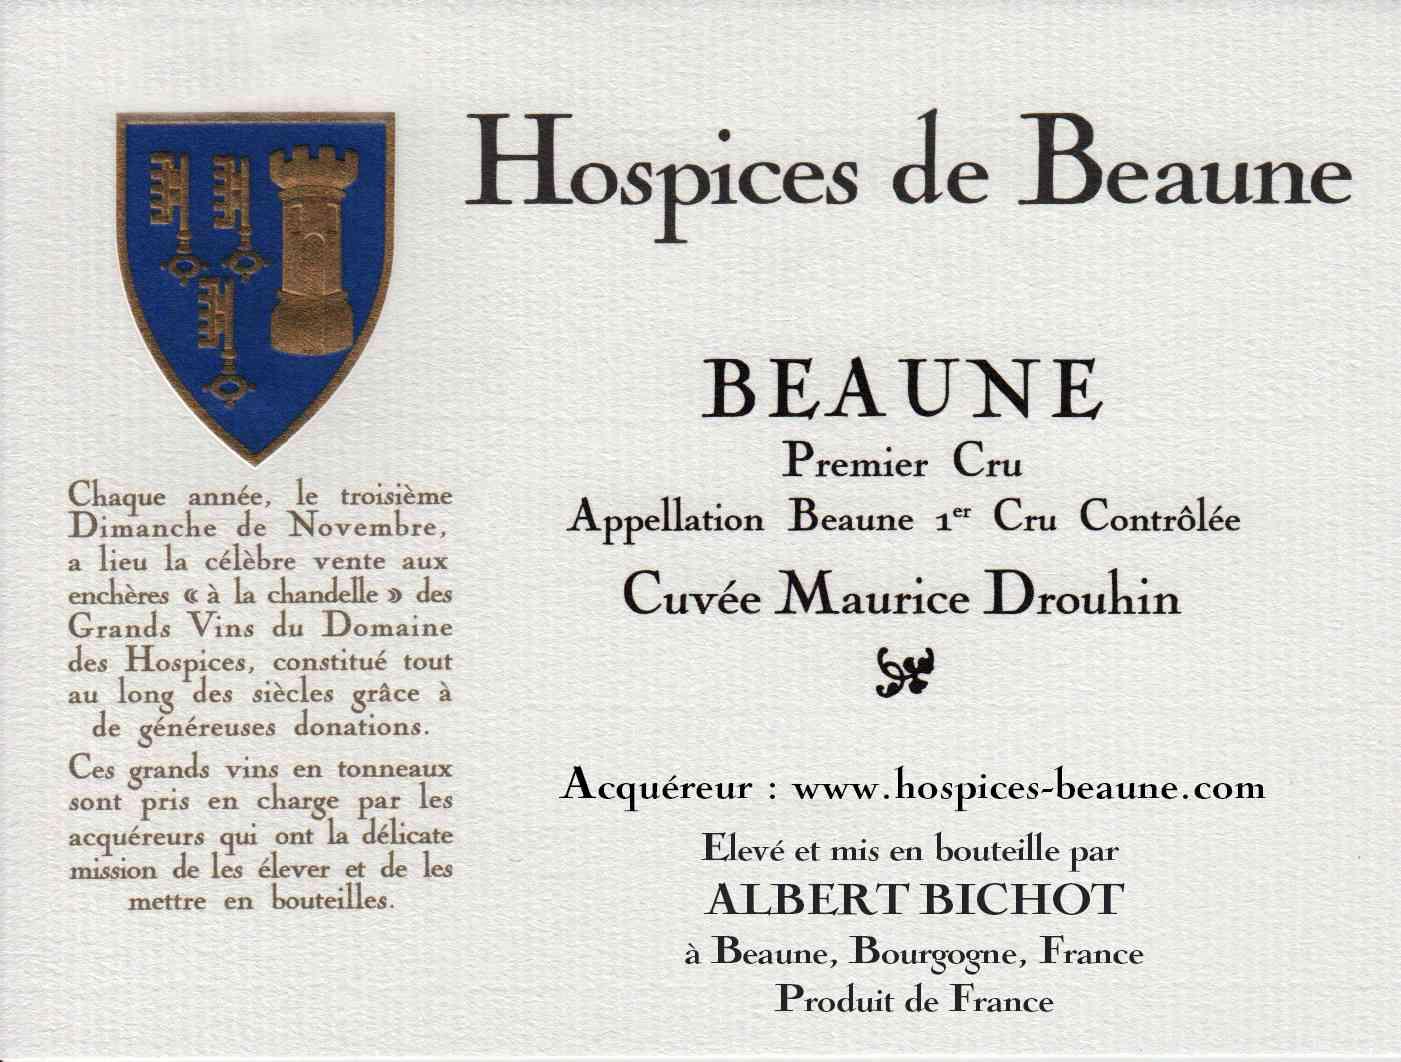 Encheres-auction-HospicesdeBeaune-AlbertBichot-Beaune1erCru-Cuvee-MauriceDrouhin